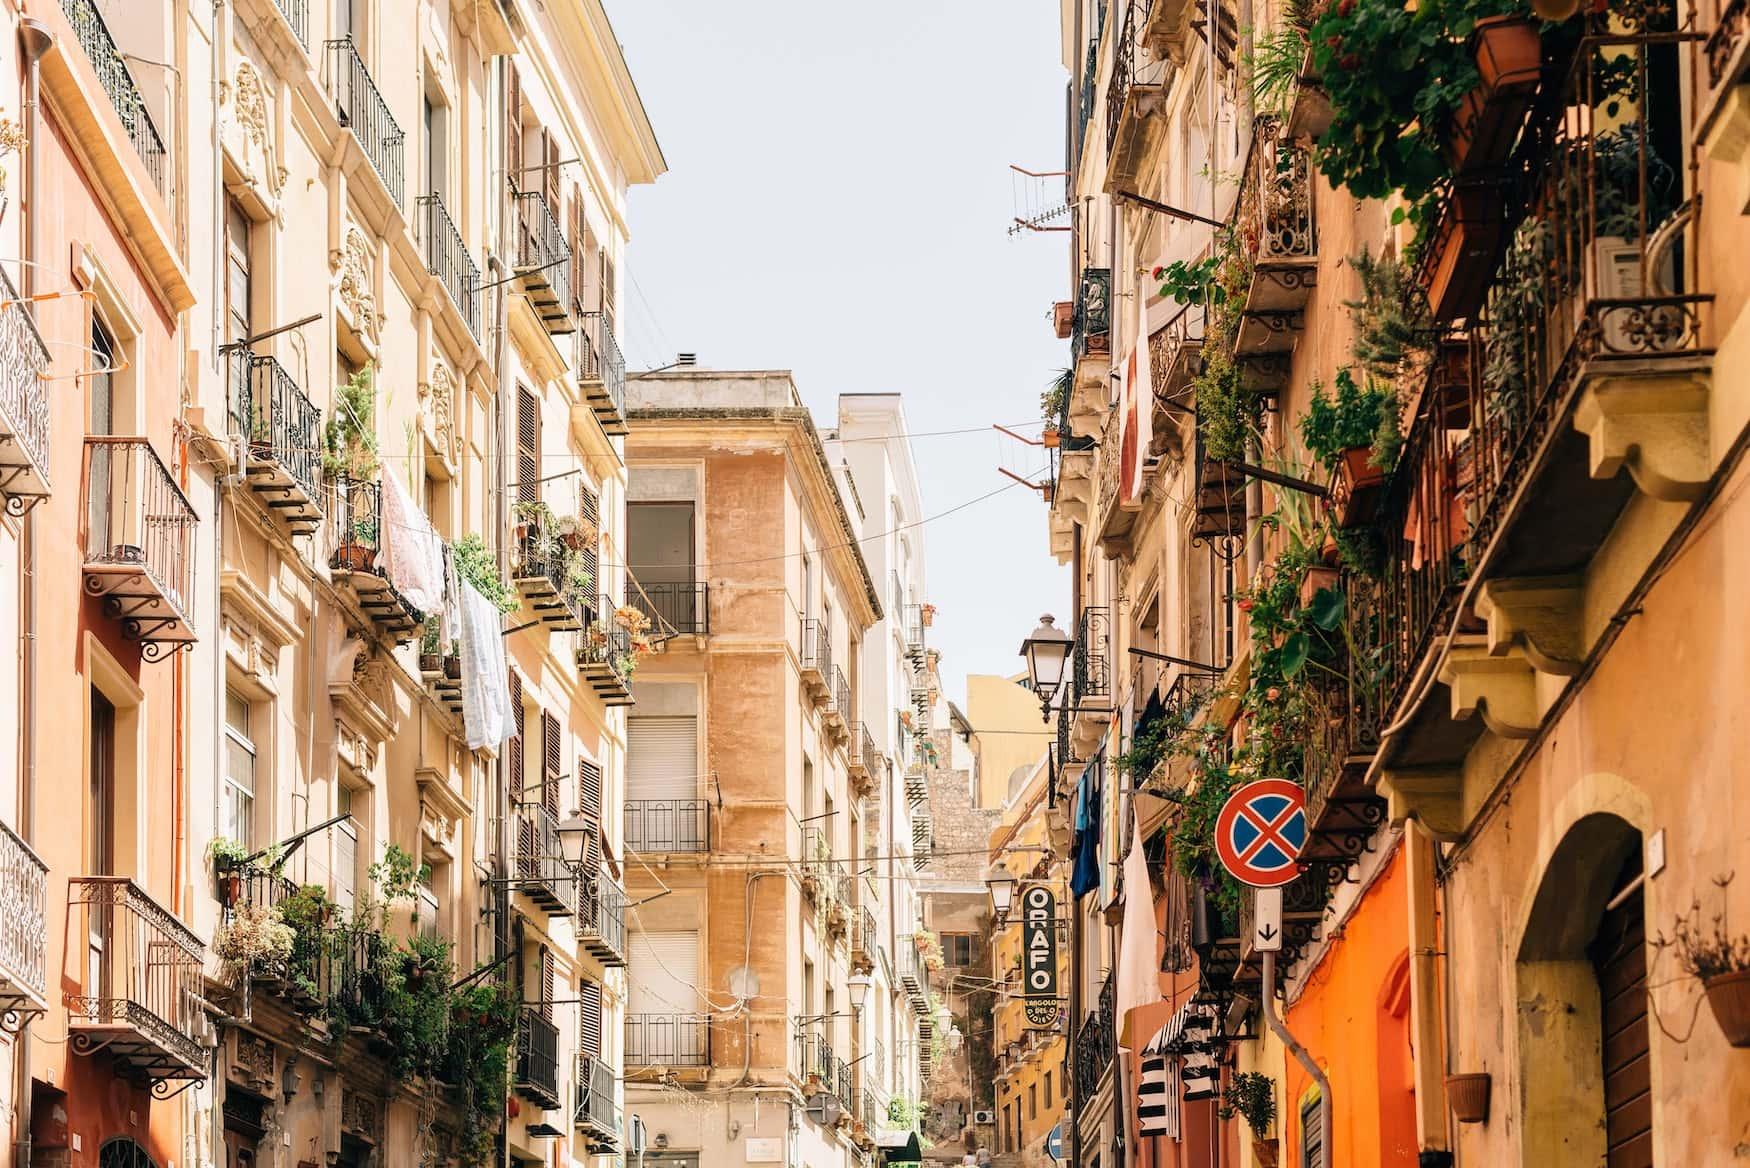 Straße in Cagliari, Sardinien